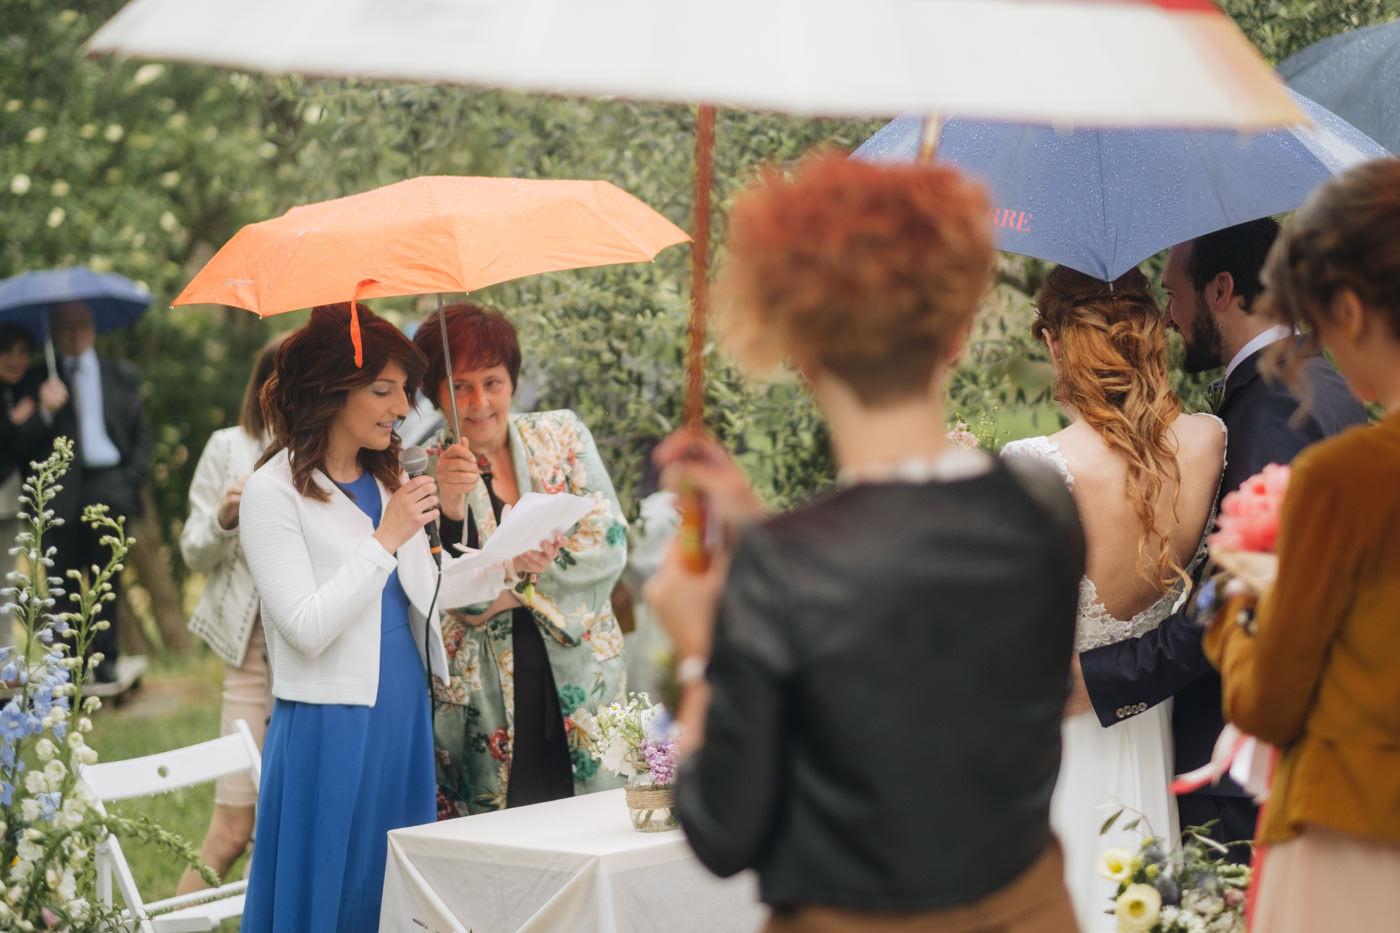 matrimoni_all_italiana_fotografo_matrimonio_toscana-37.jpg